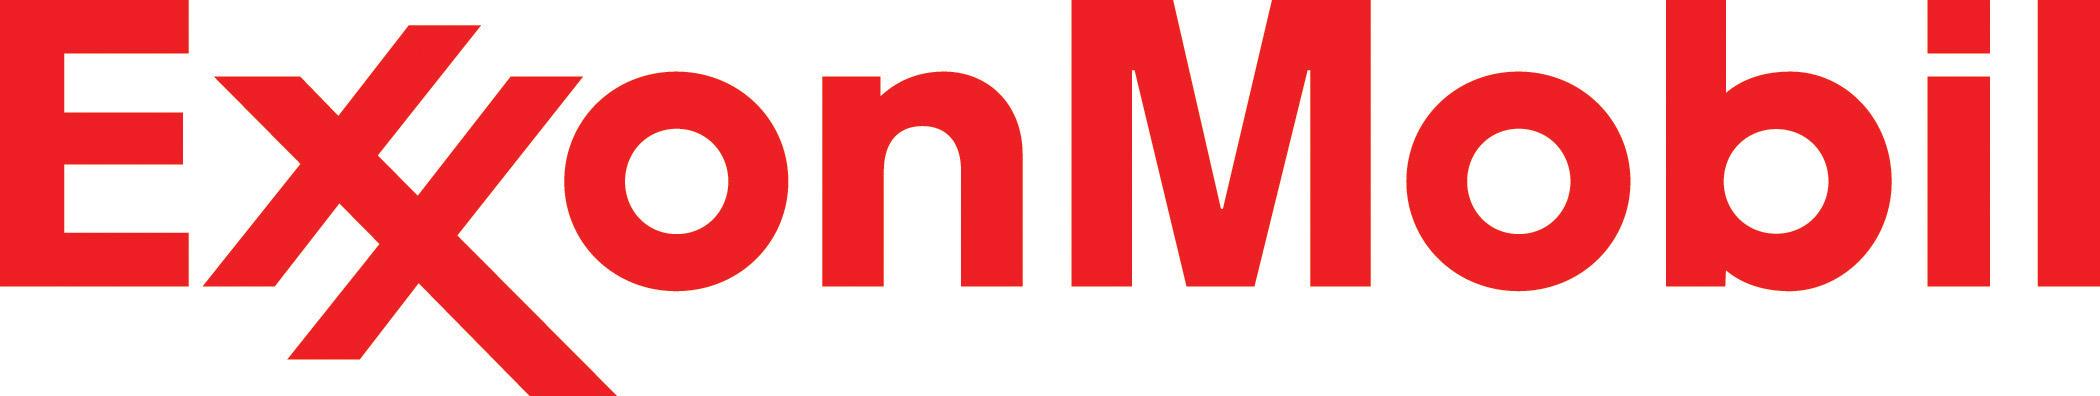 ExxonMobil Red